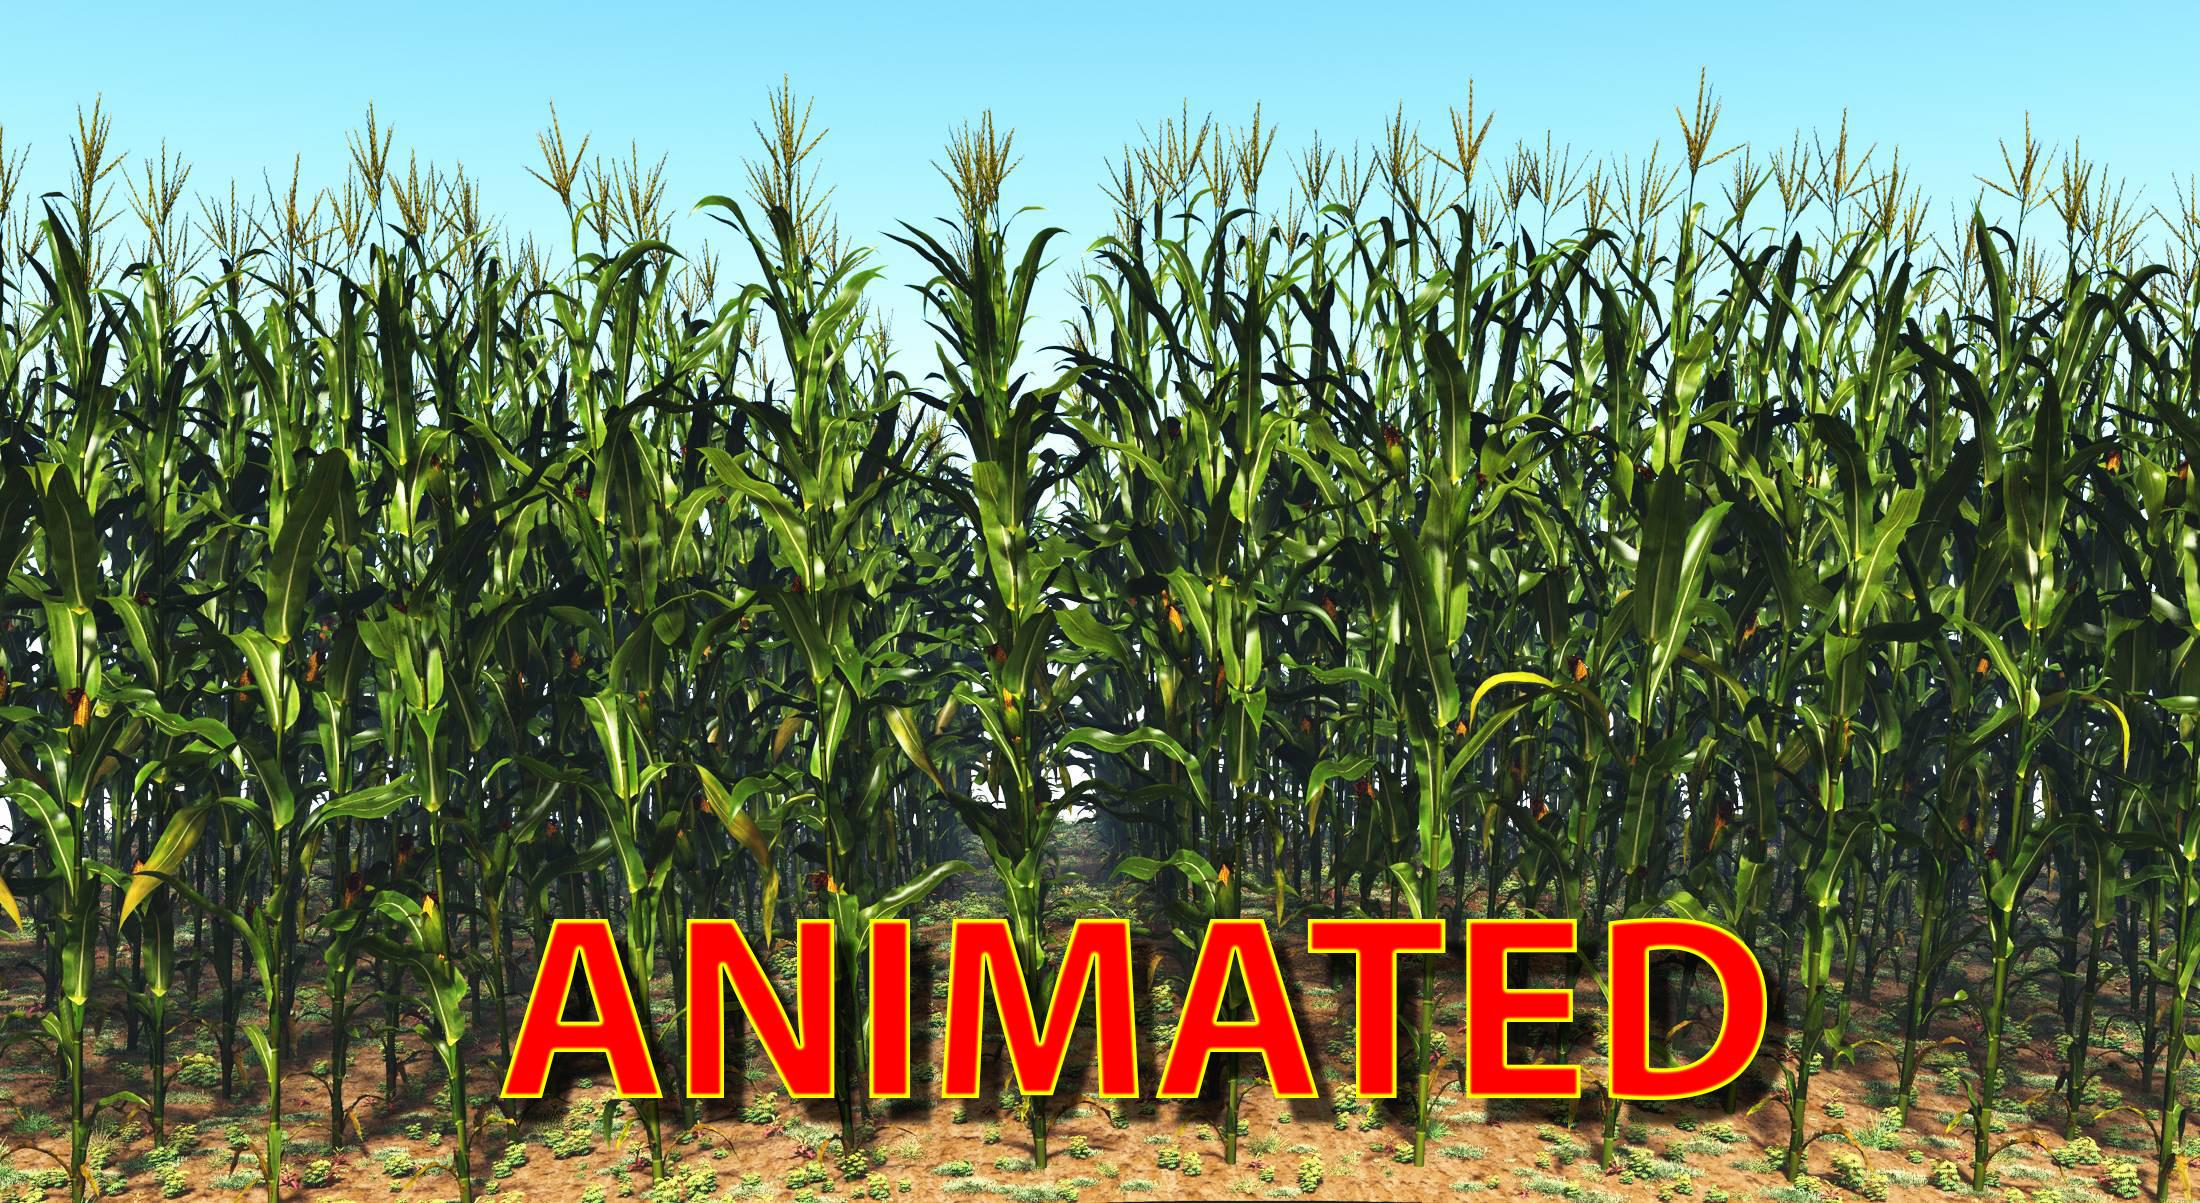 1 animated.jpg